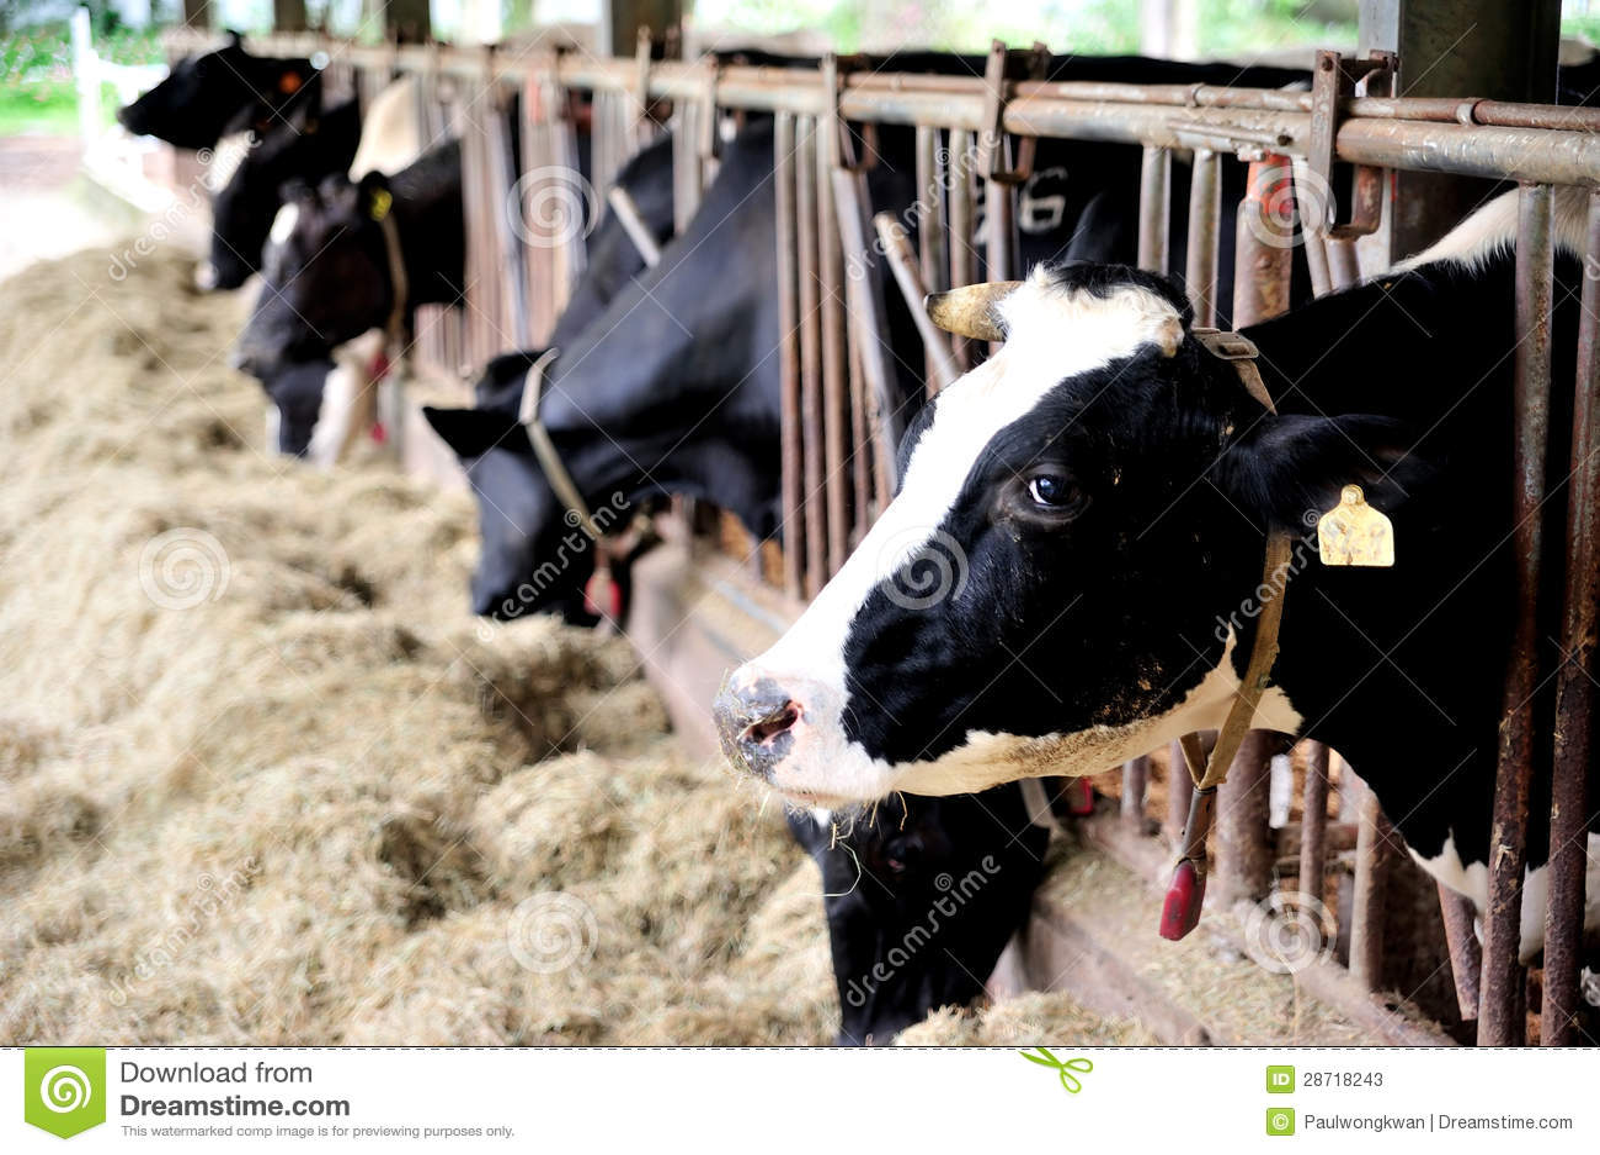 大奶牛bt_奶牛